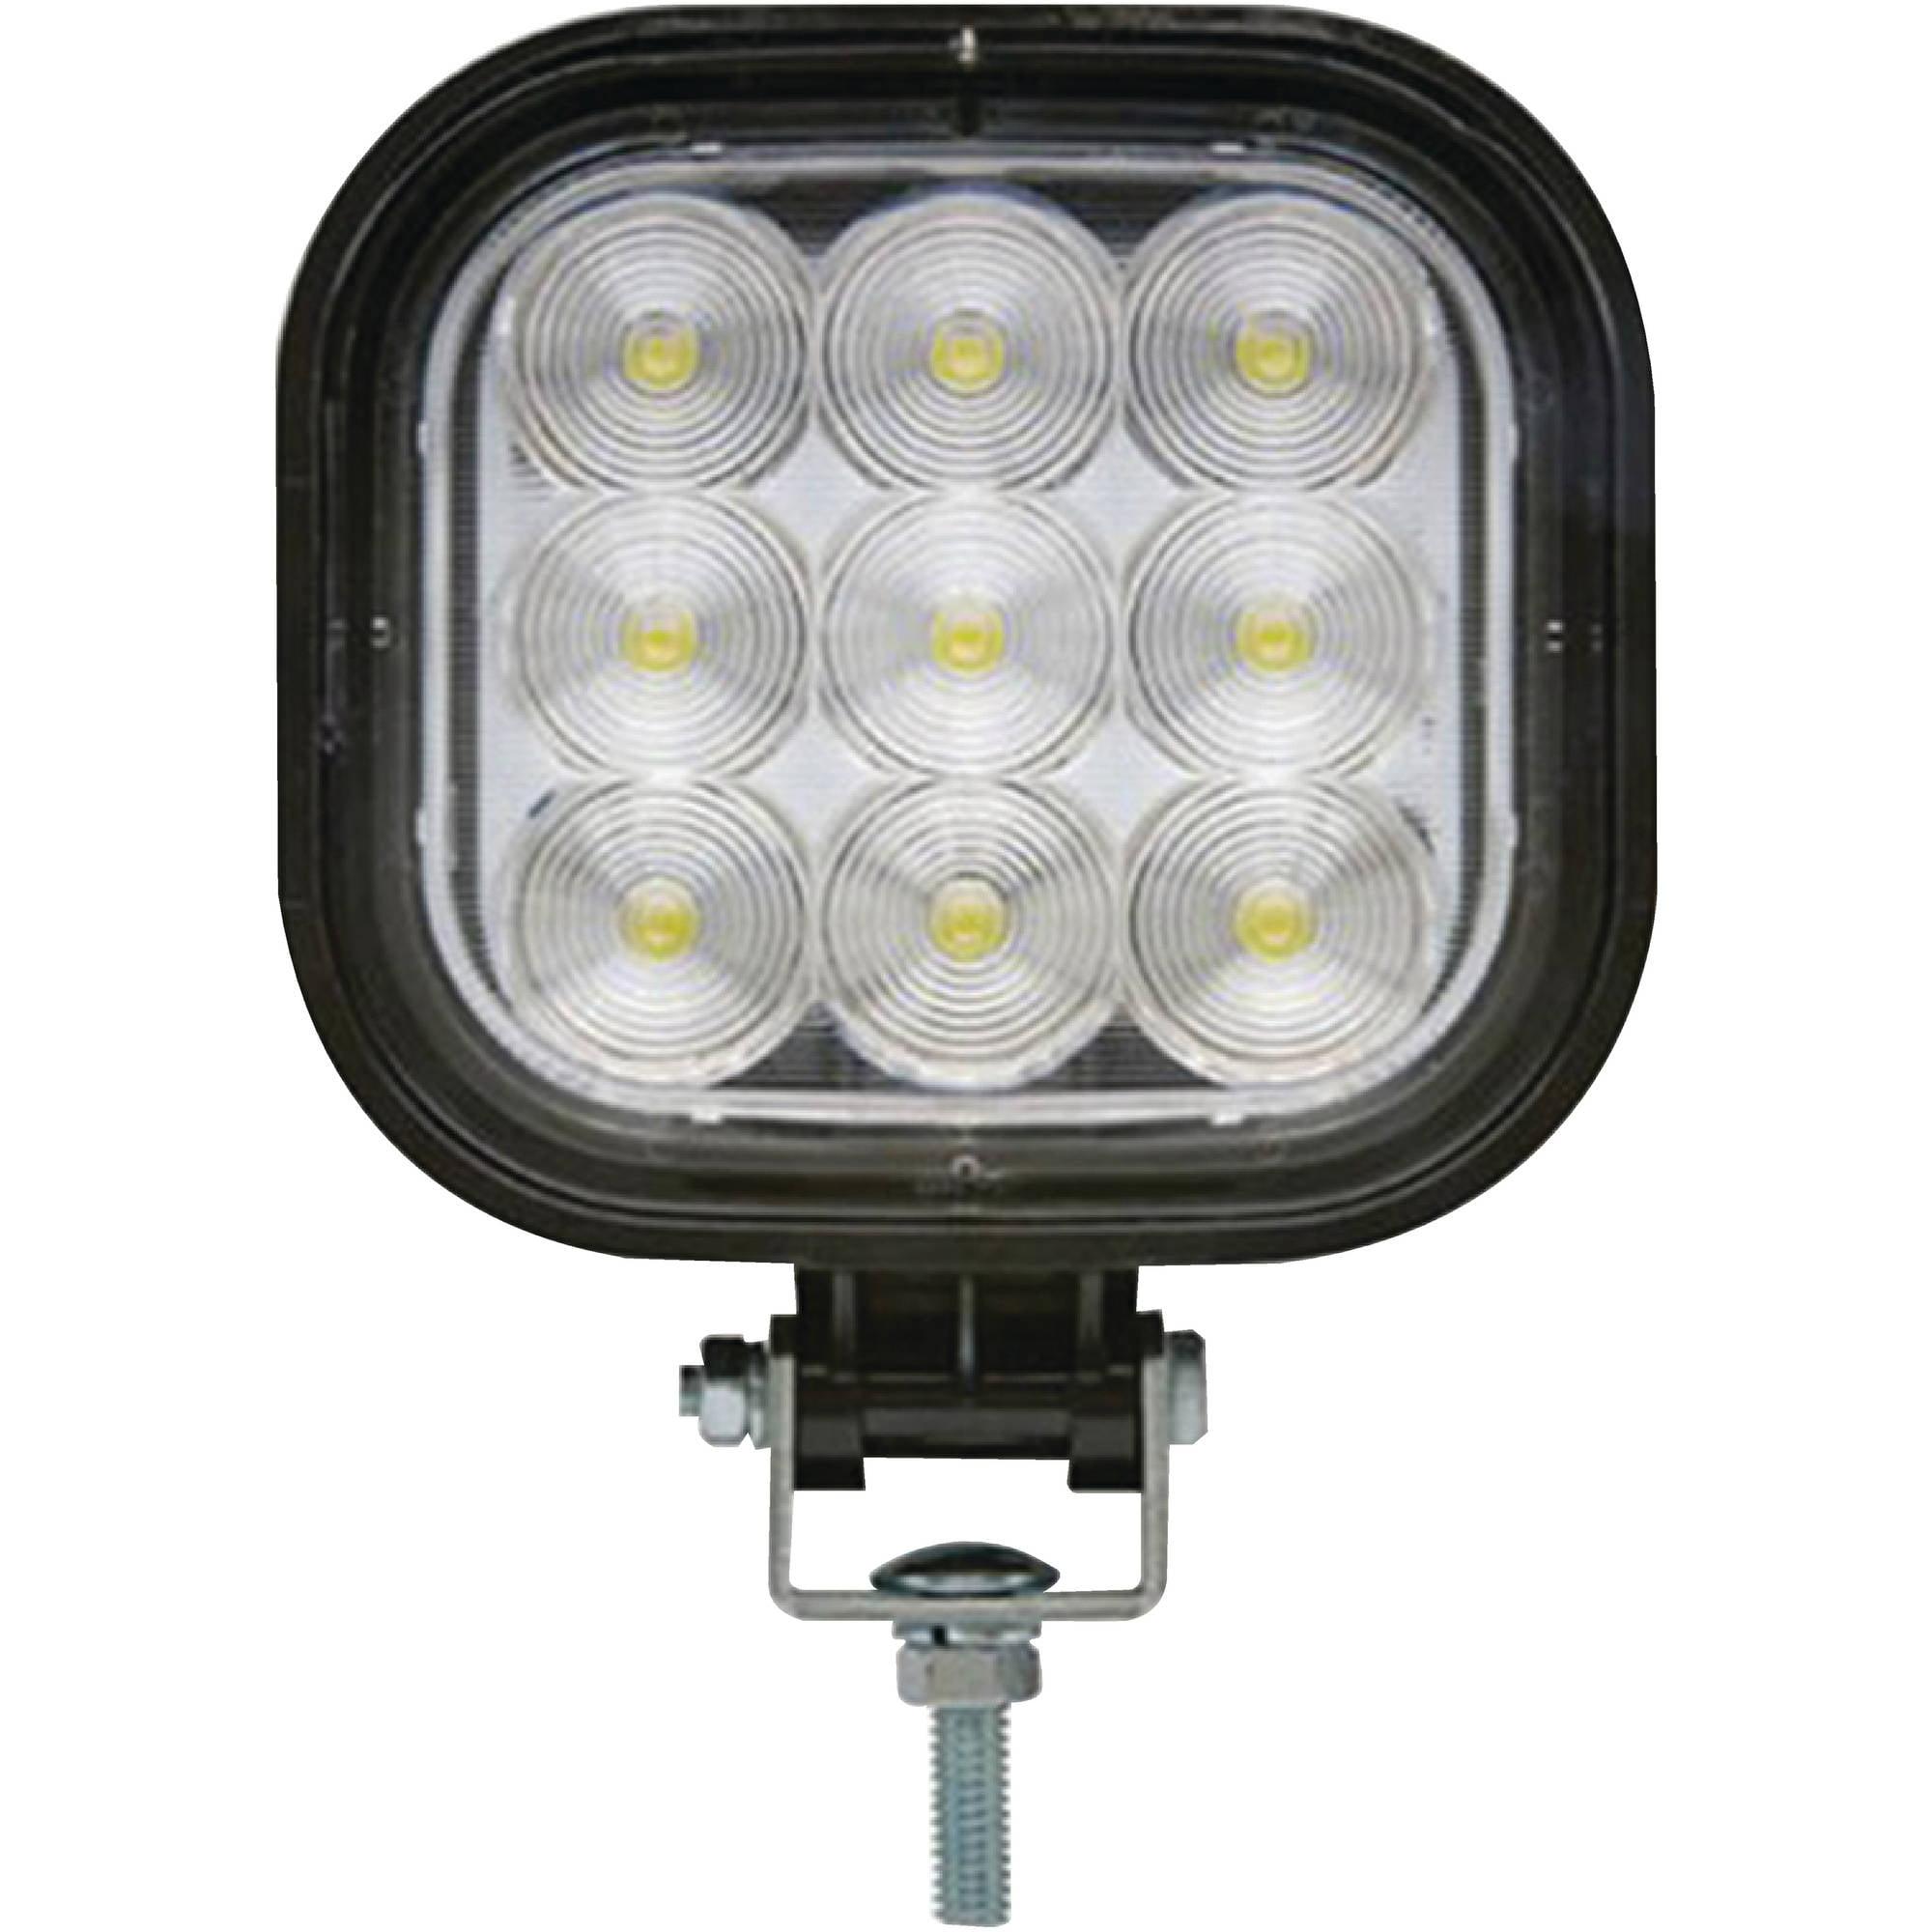 Optronics TLL50FS Opti-Brite Polycarbonate 12V and 24V LED Work Floodlight, IPX9K Rating, 9 Diodes